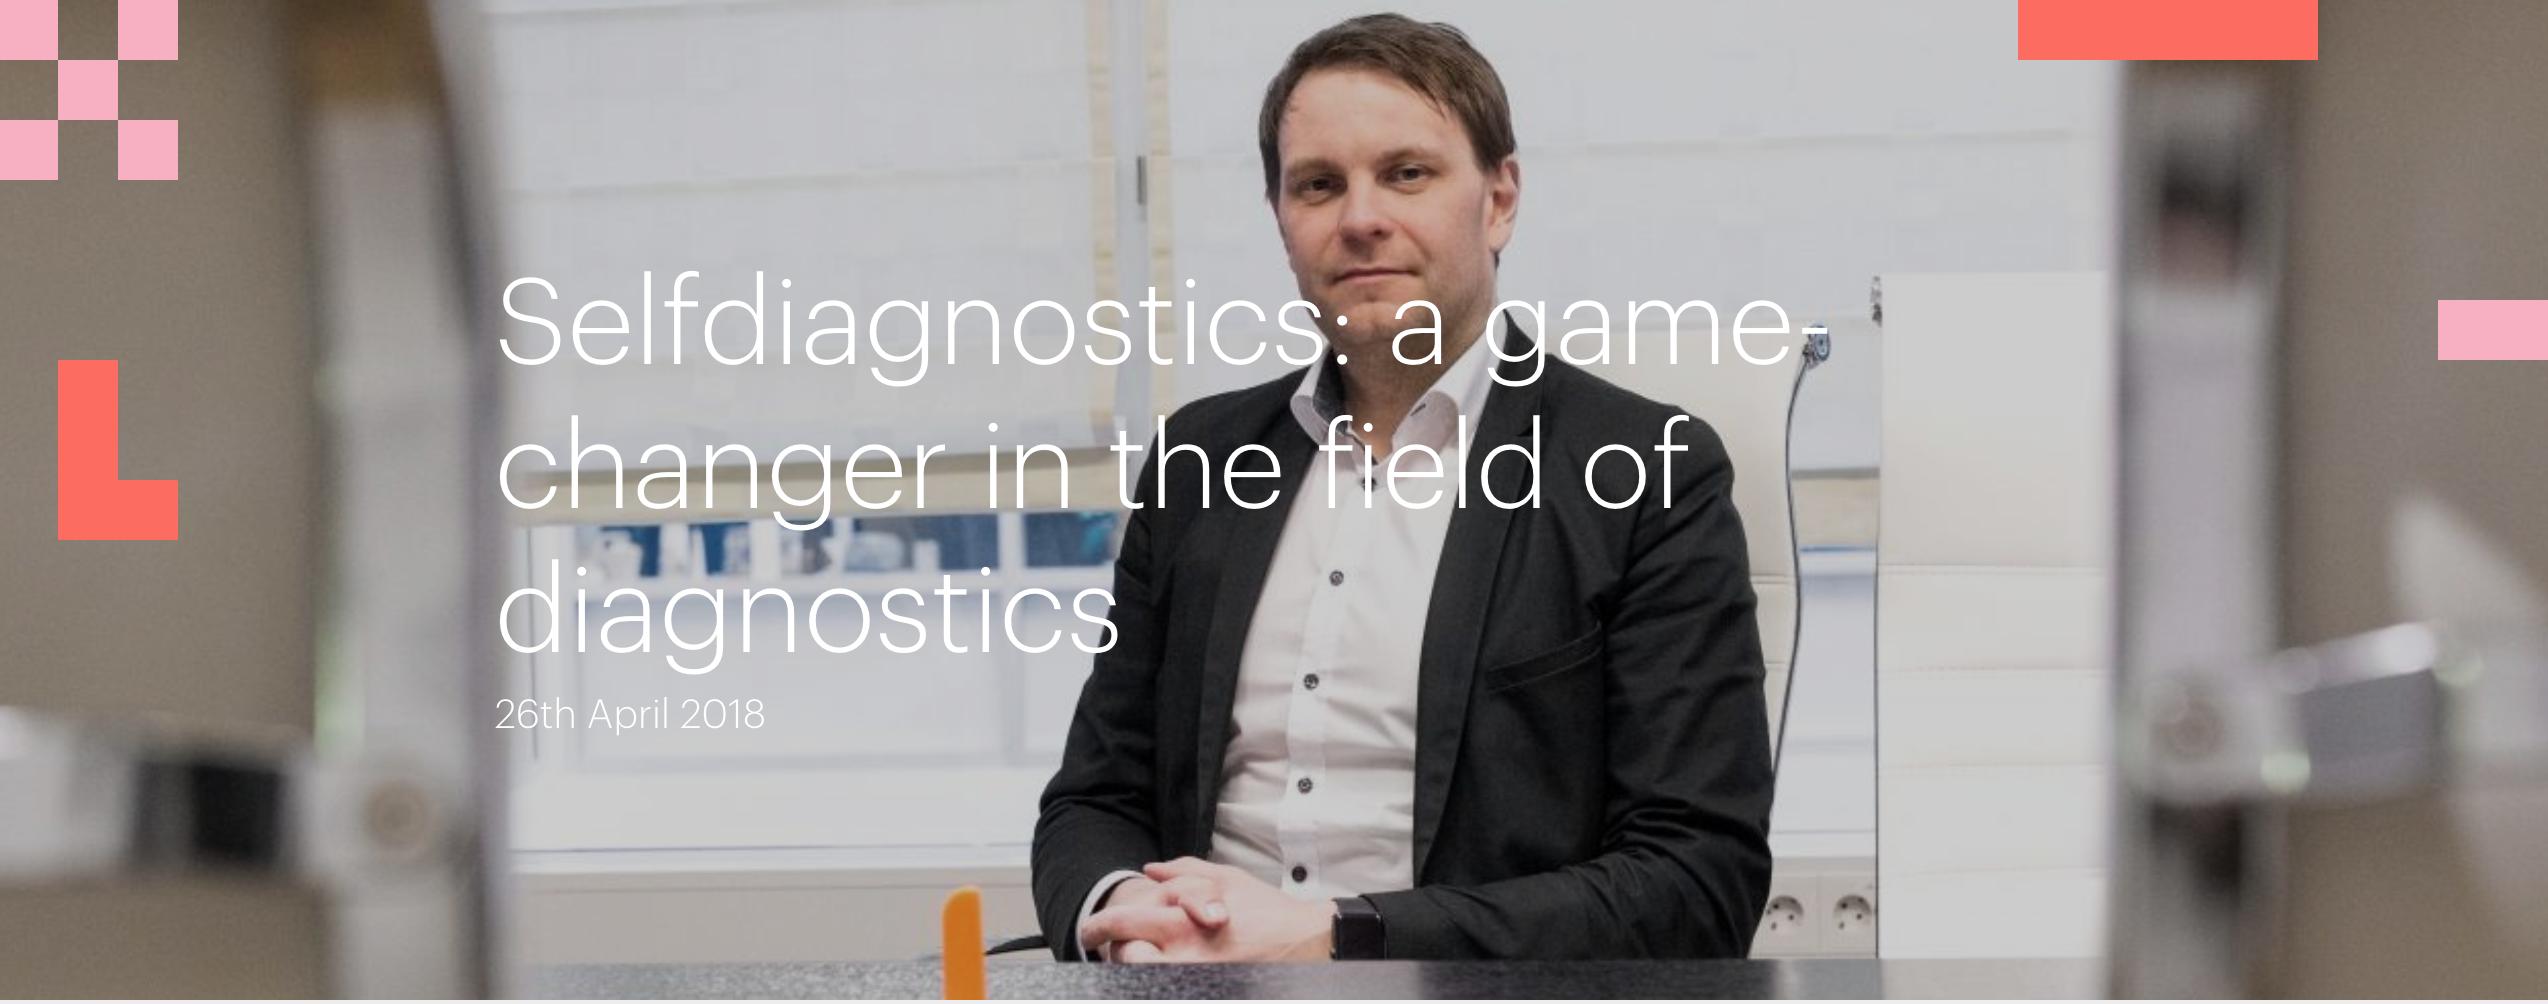 Selfdiagnostics: a game-changer in the field of diagnostics